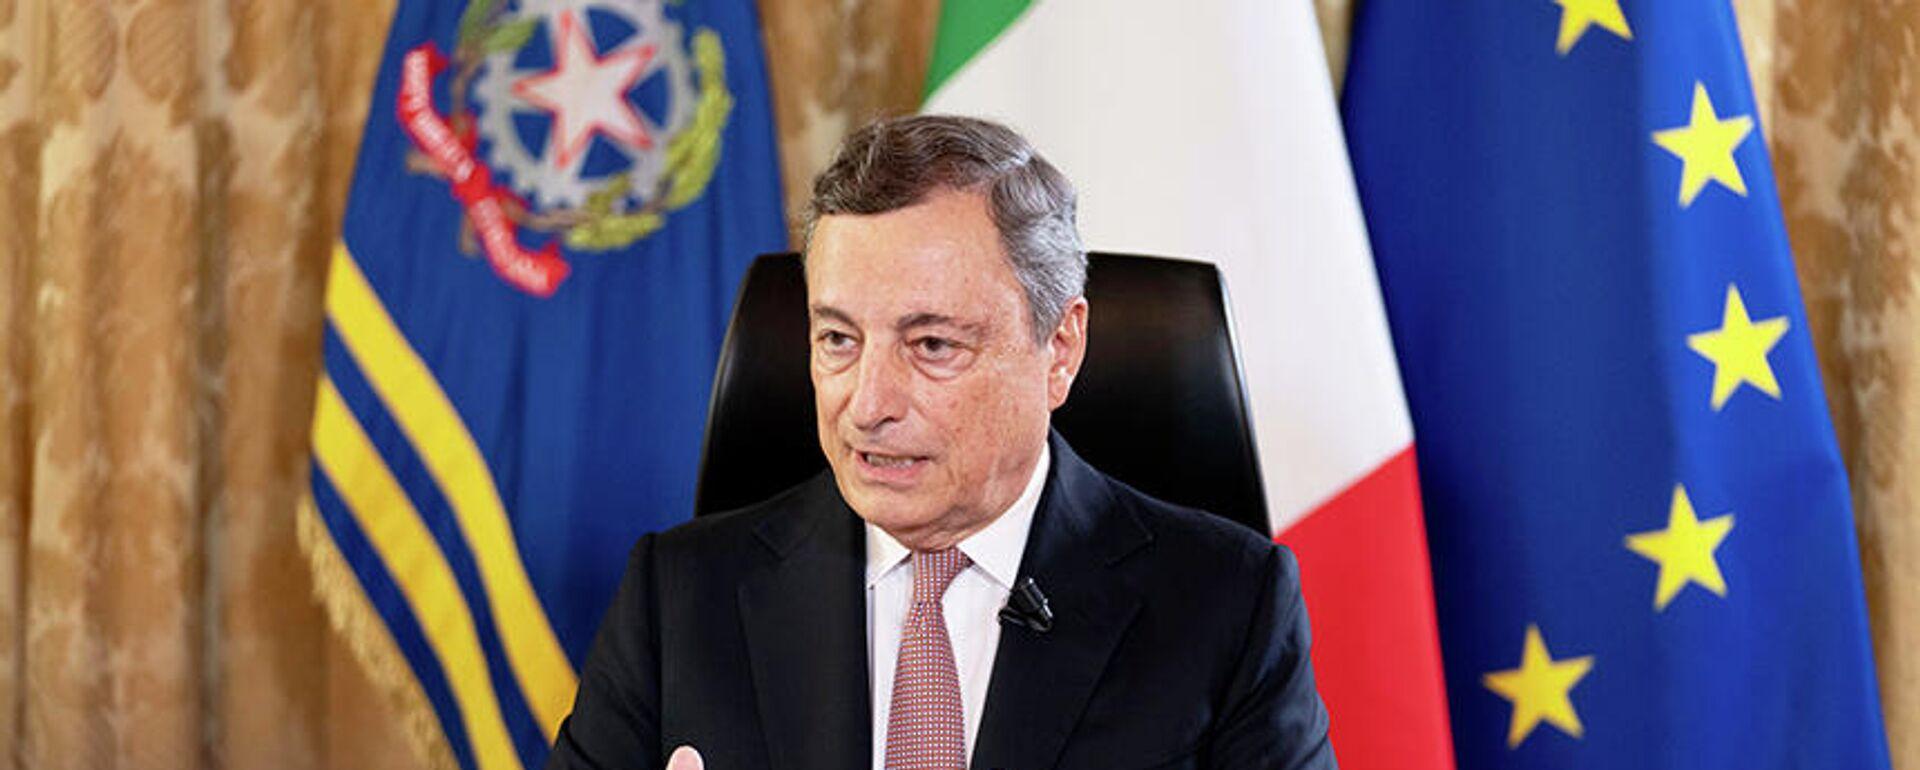 Il premier Draghi - Sputnik Italia, 1920, 23.08.2021